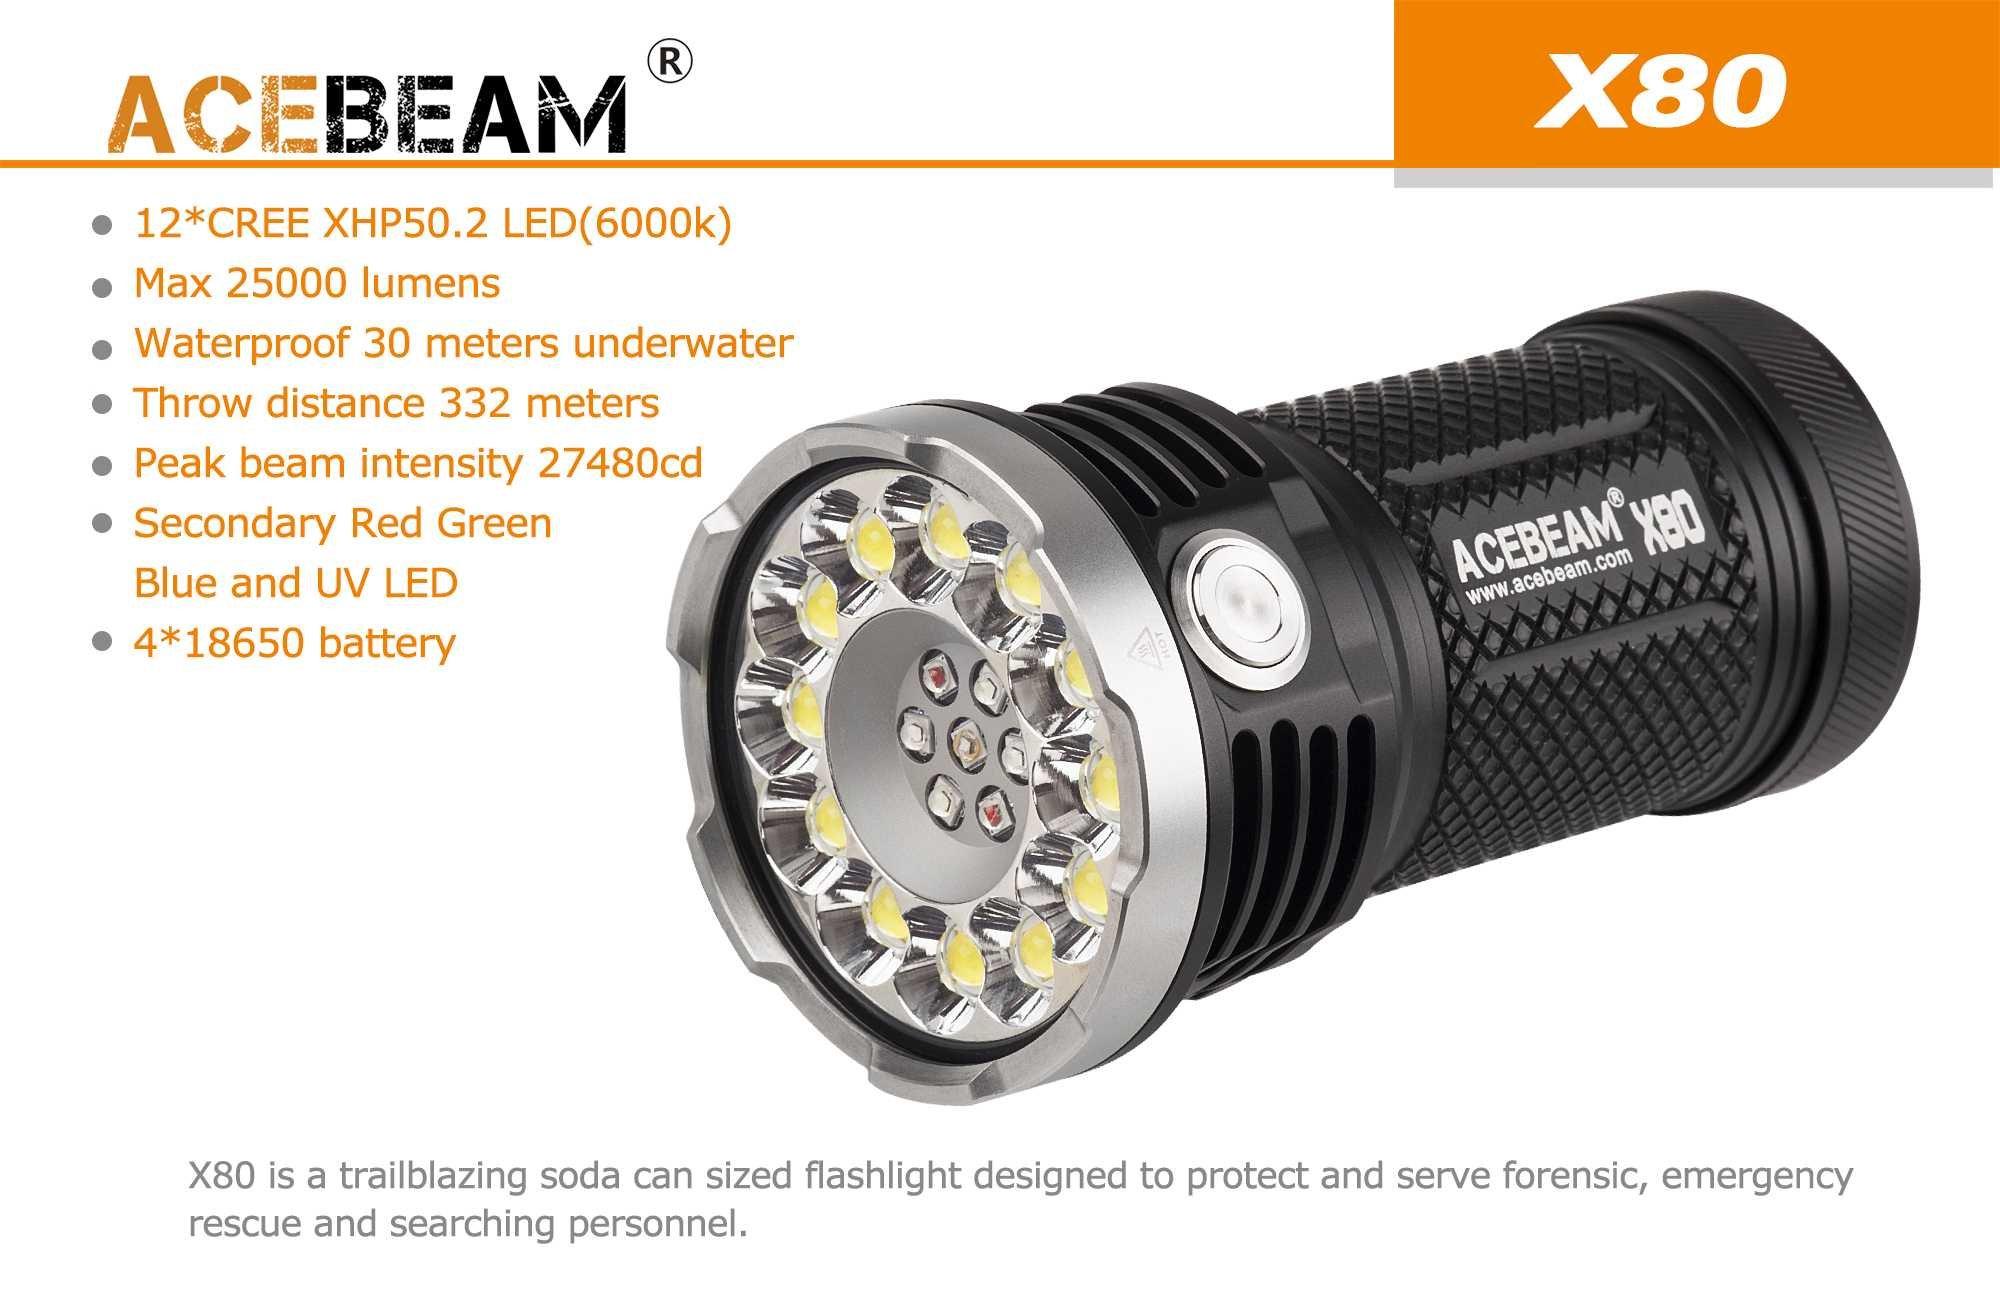 ACEBEAM X80 LED Flashlight 12x Cree XHP50.2 25000 Lumens 5-color Light Beam Flashlights Included 4 3100mah Batteries by Acebeam (Image #5)